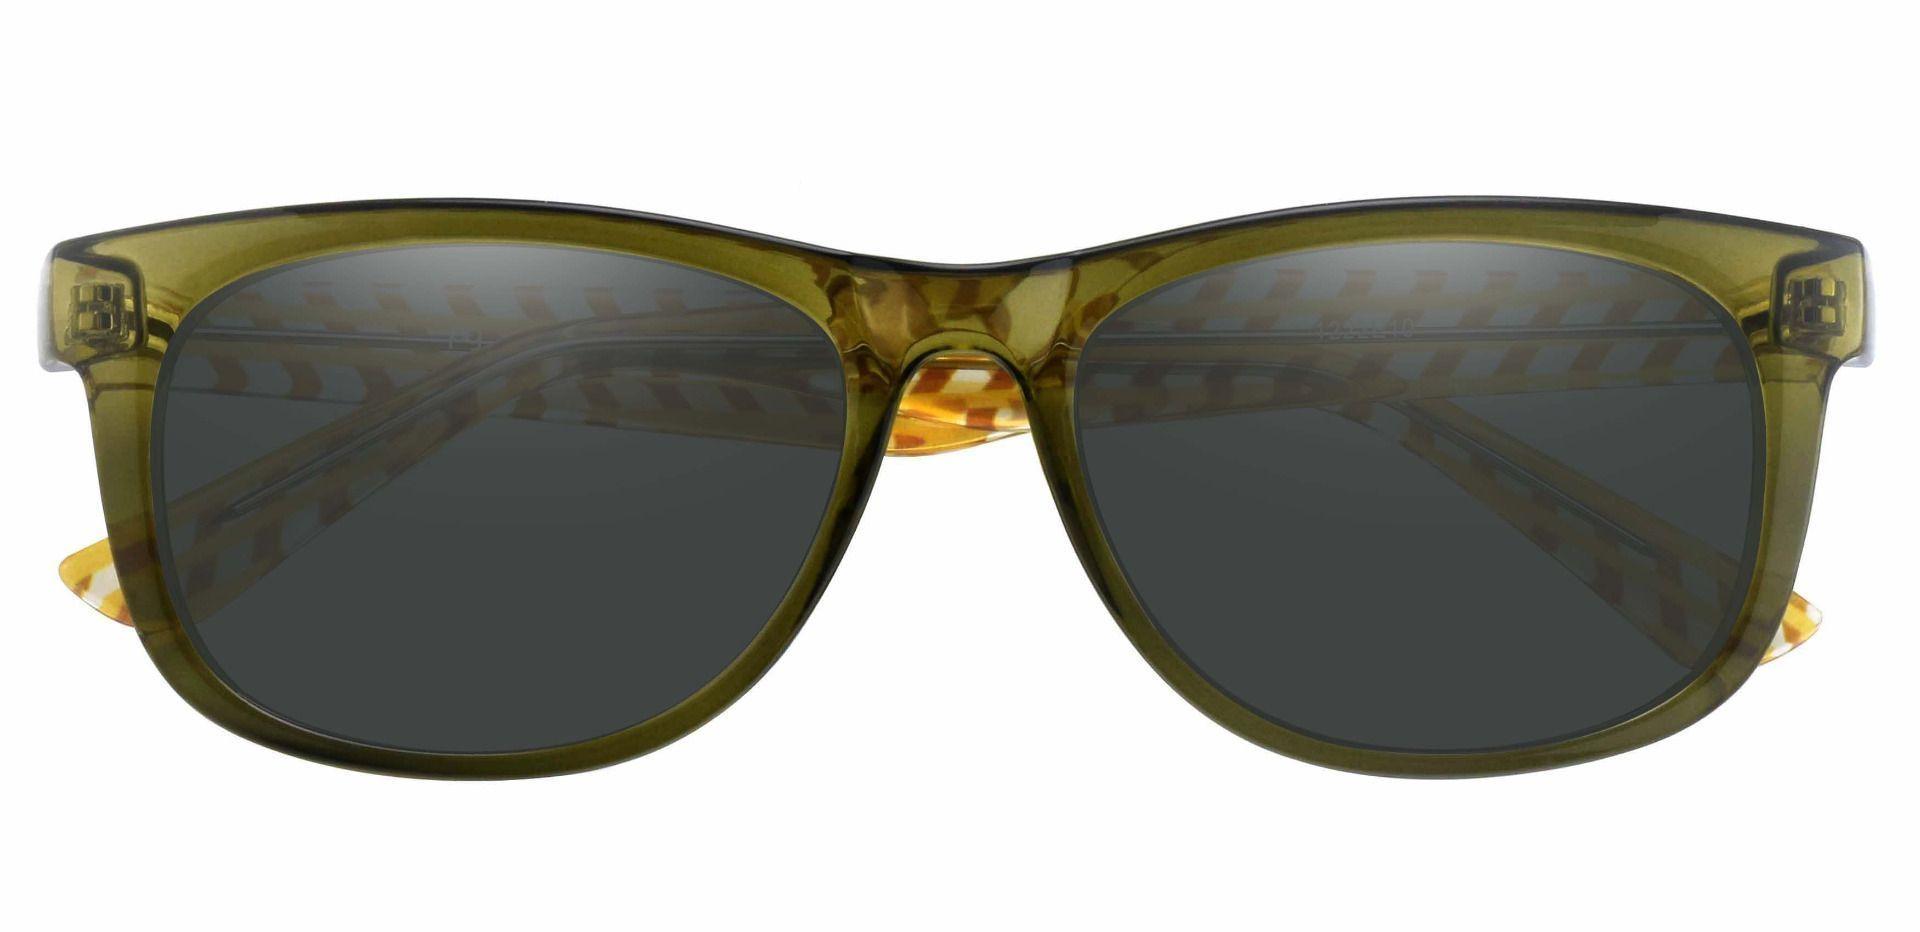 Bergamot Classic Square Prescription Sunglasses - Green Frame With Gray Lenses